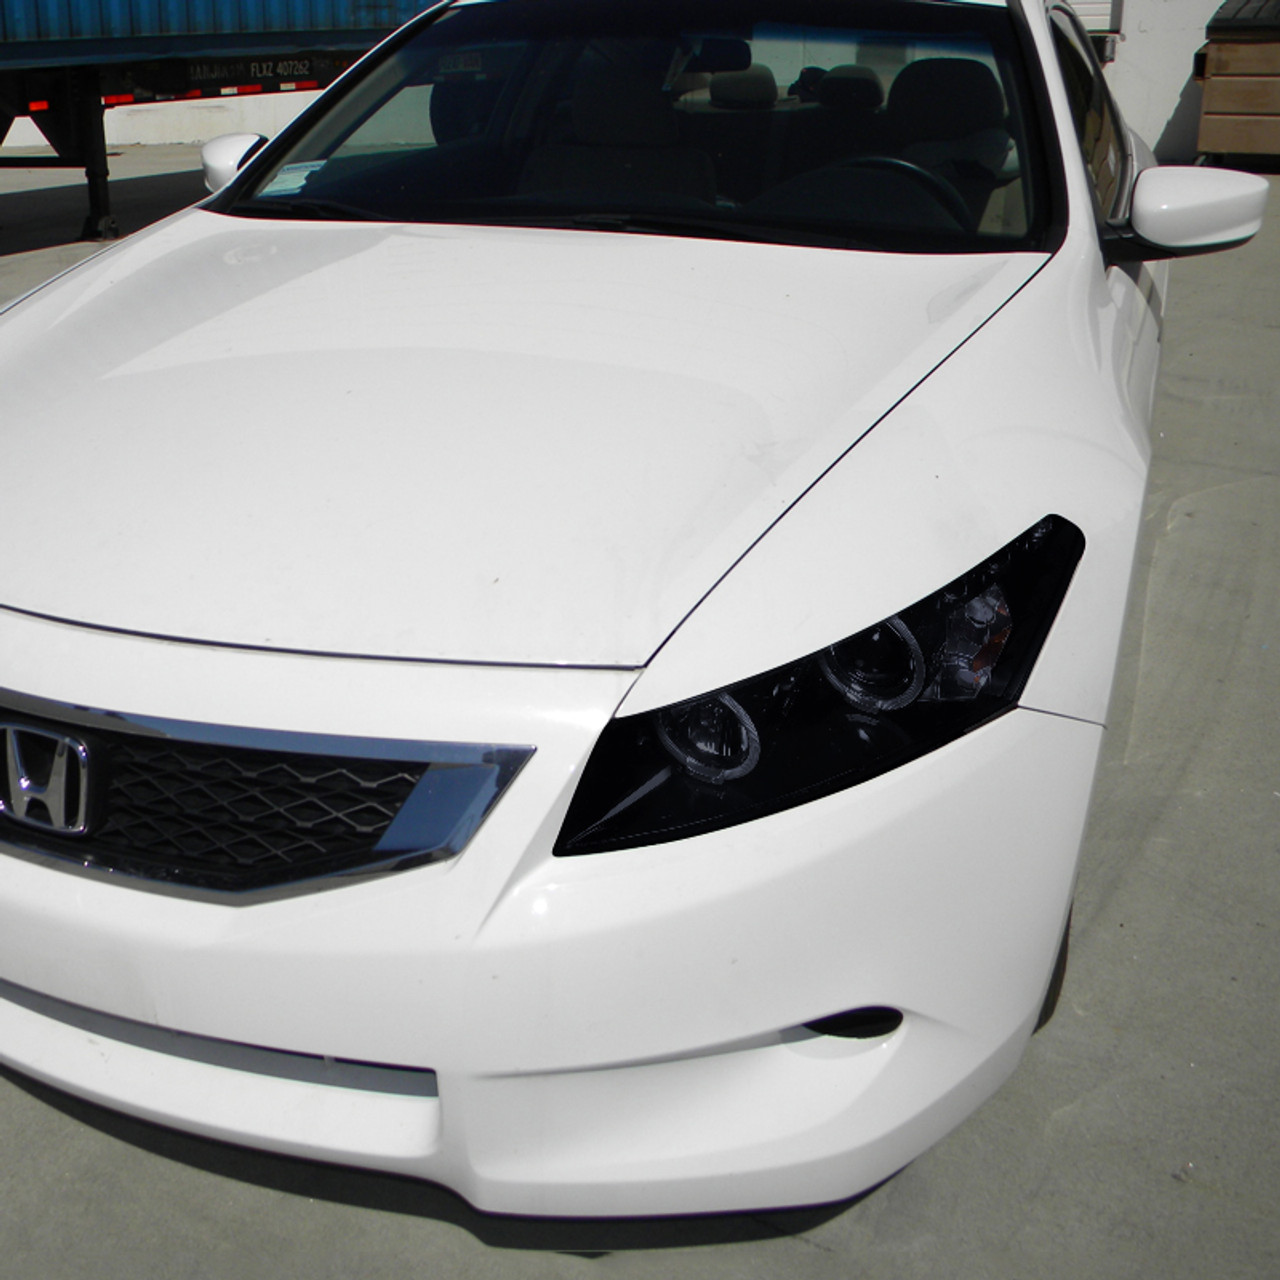 2008 2012 Honda Accord Coupe Dual Halo Projector Headlights Glossy Black Housing Smoke Lens Spec D Tuning